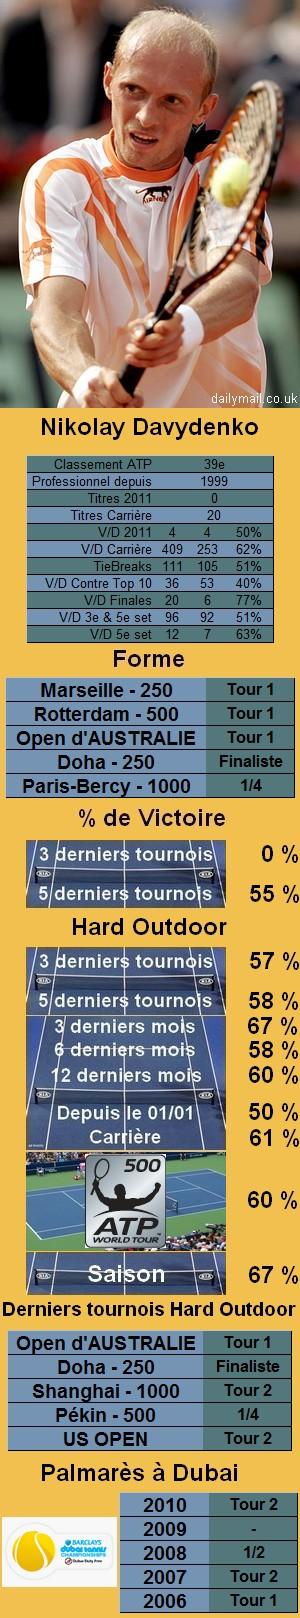 Statistiques tennis Nikolay Davydenko